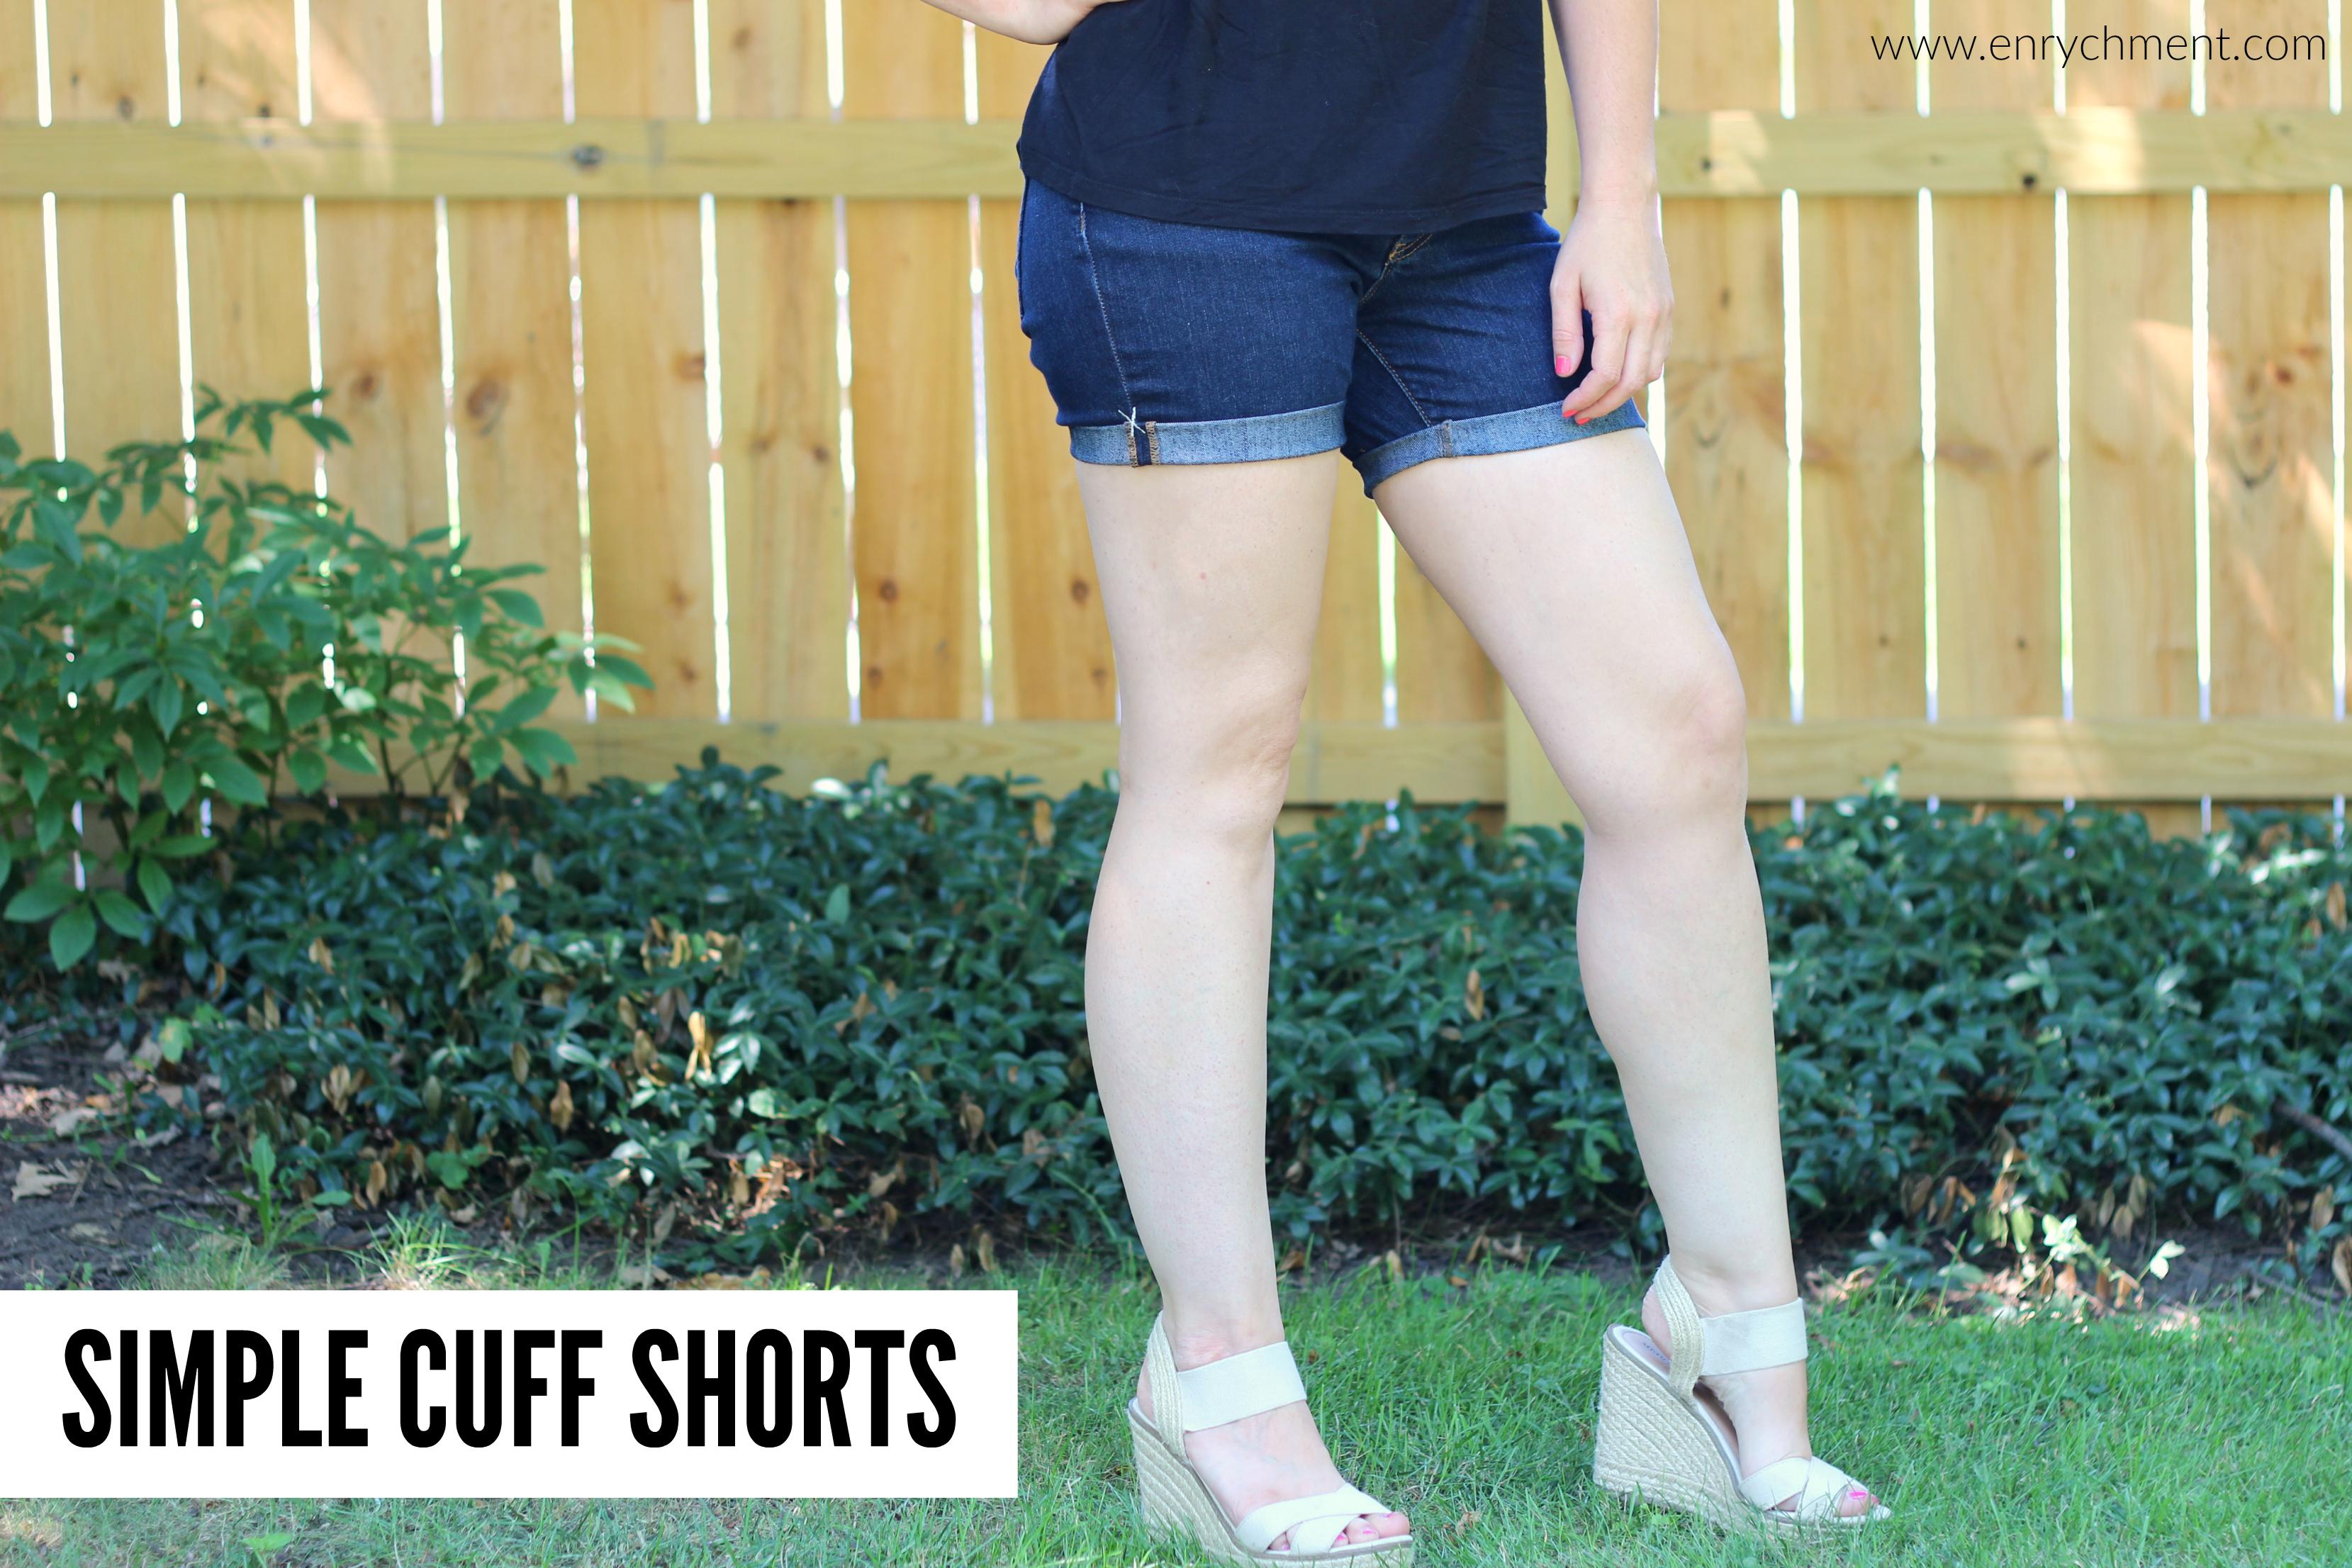 simple cuff shorts